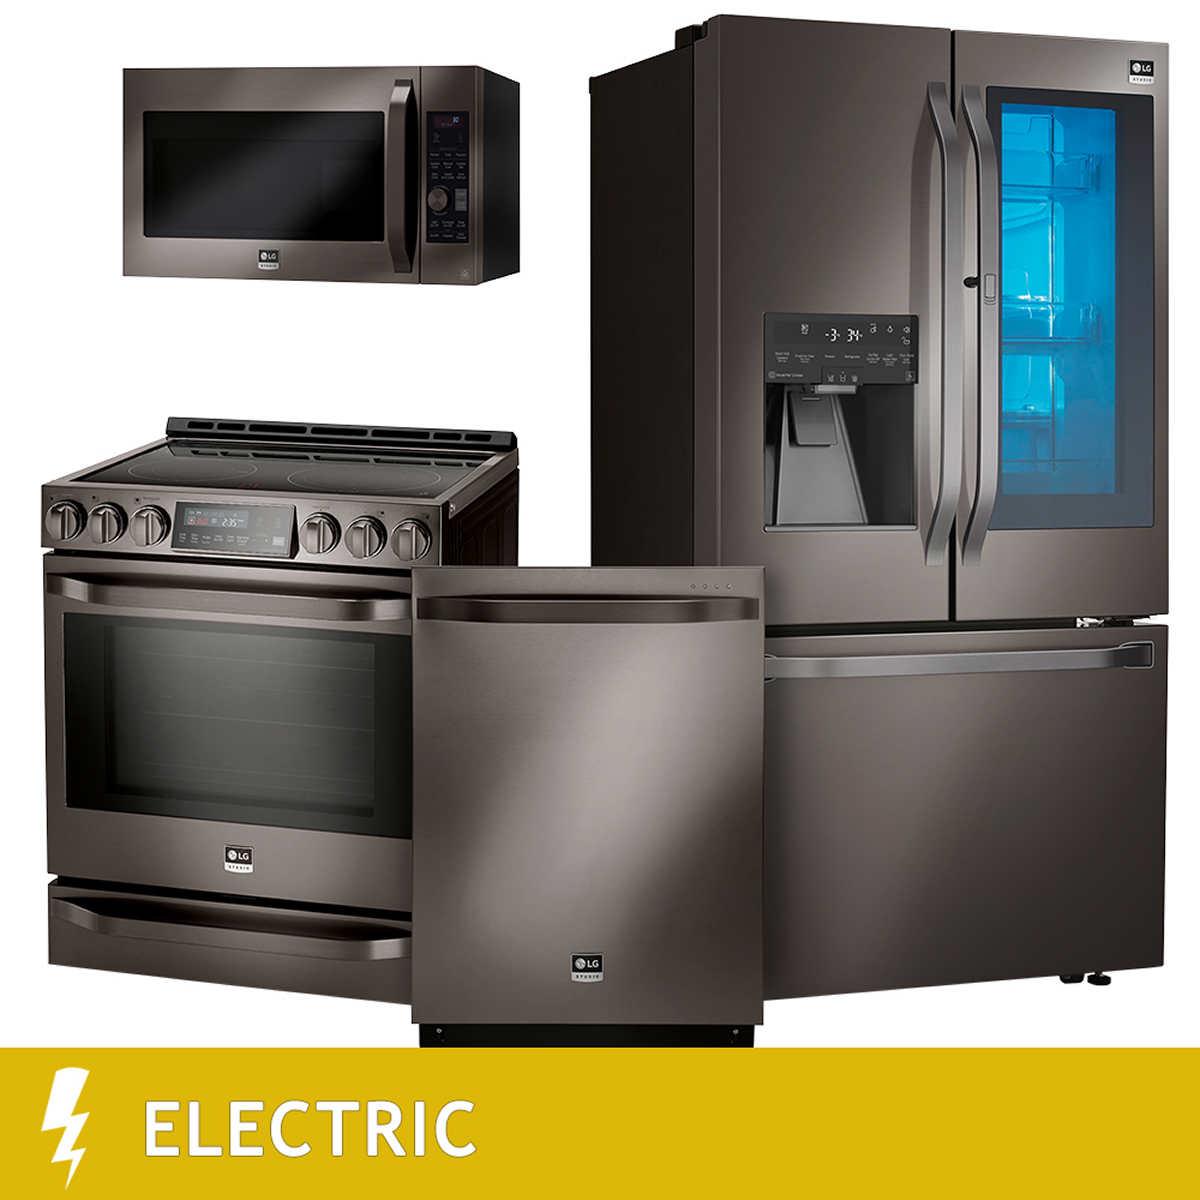 Uncategorized Brandsmart Kitchen Appliances washer kitchen appliance package deals at brandsmart usa including collection samsung suite pictures garden and appliances